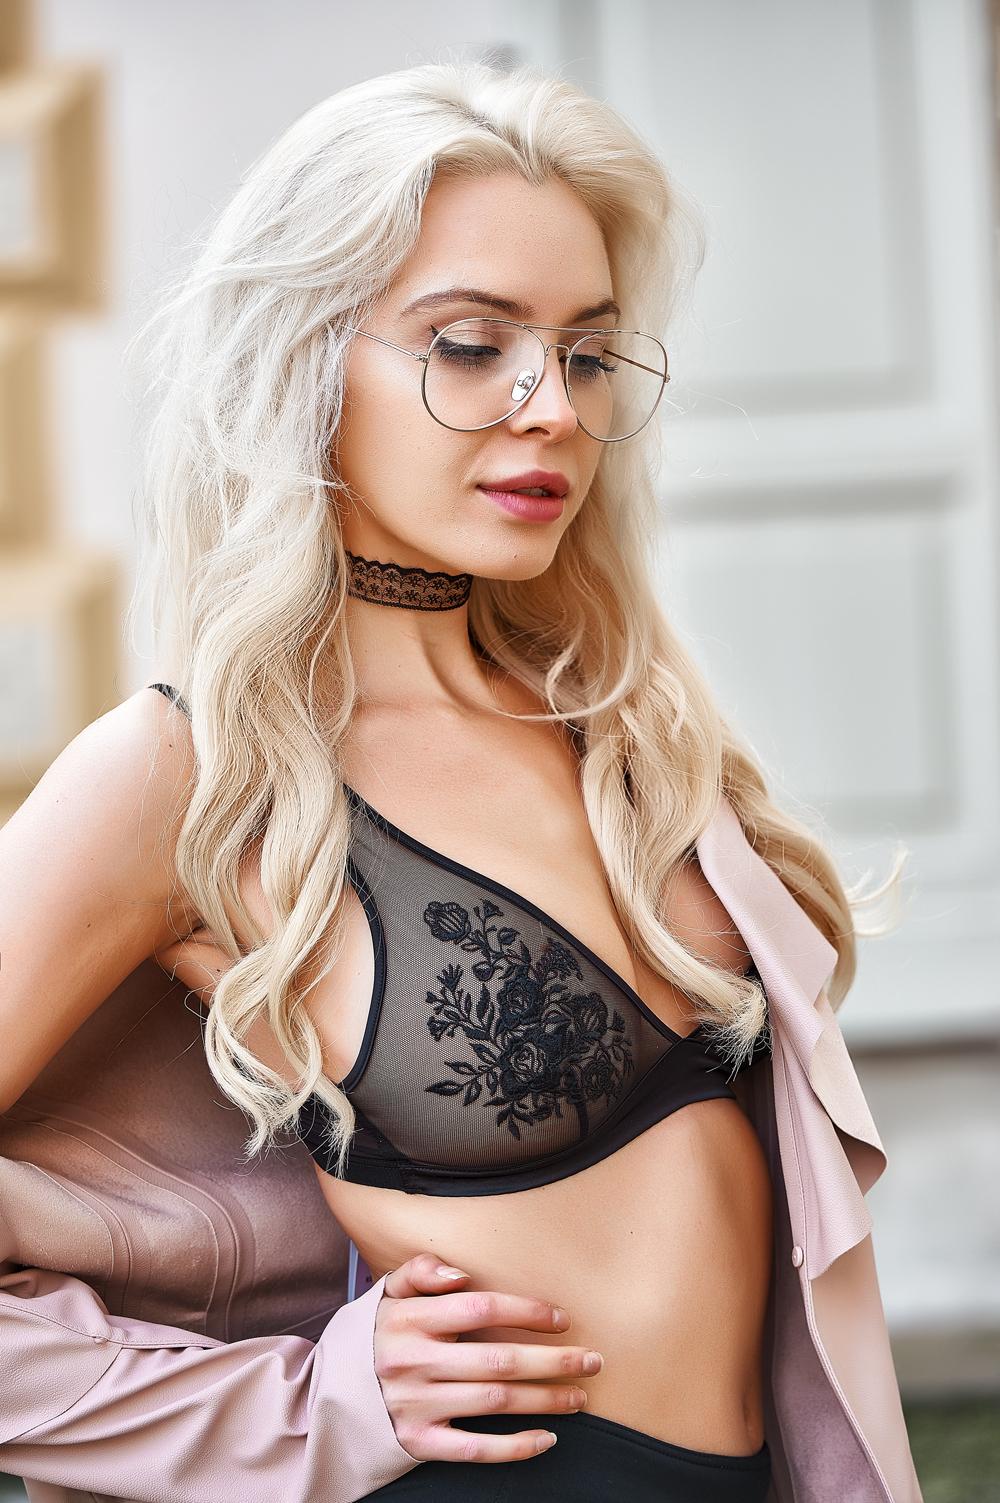 Justyna Pankowska,wilanów, warszawa, street, , dzienne, no makeup, nude face, sweet, girl, fashion,6.jpg